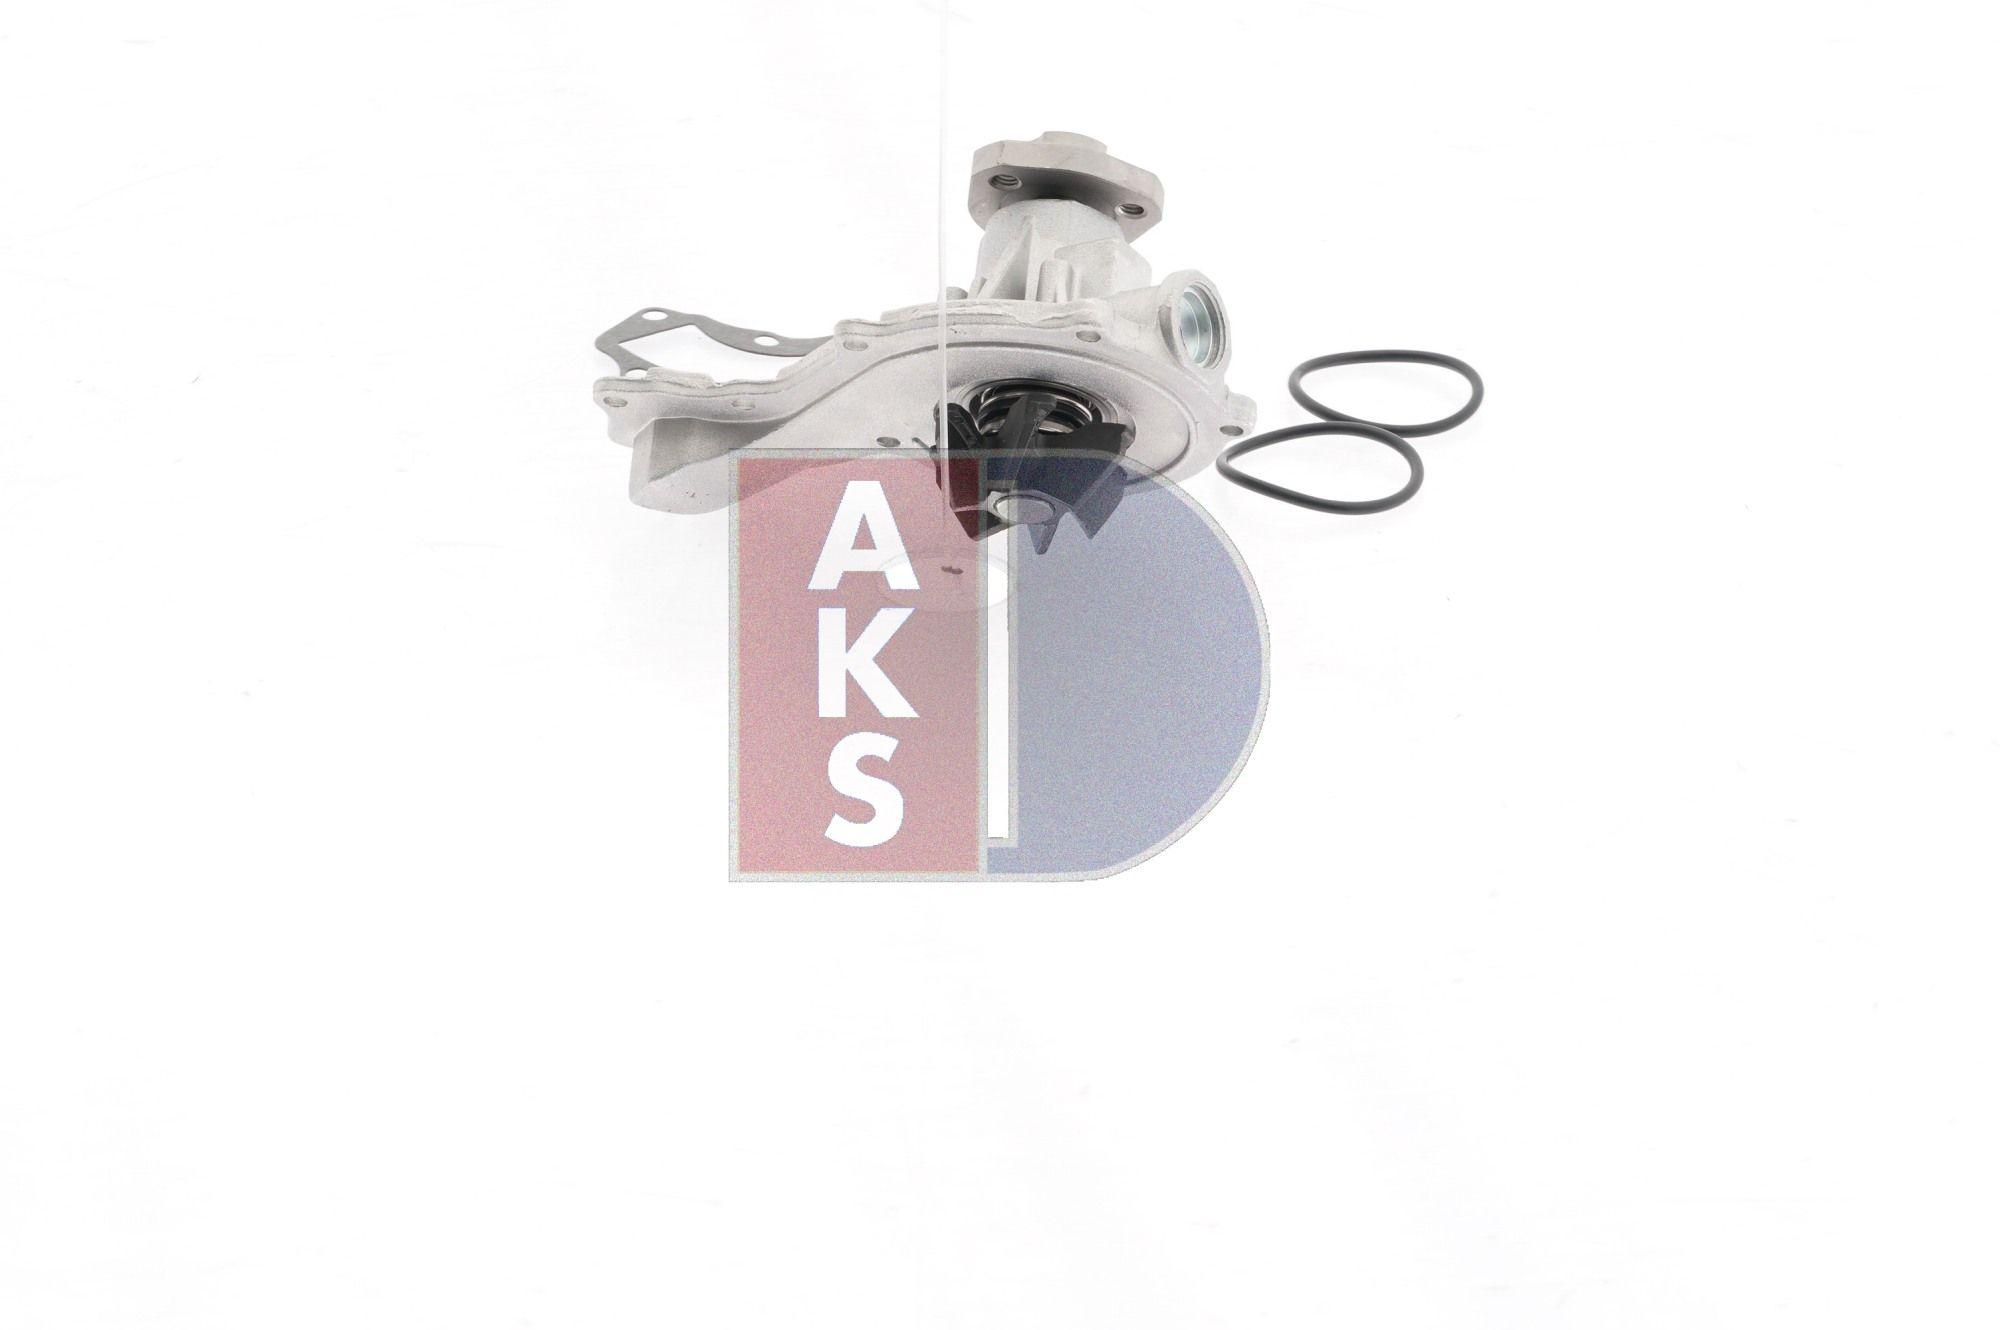 570003N Kühlwasserpumpe AKS DASIS - Markenprodukte billig